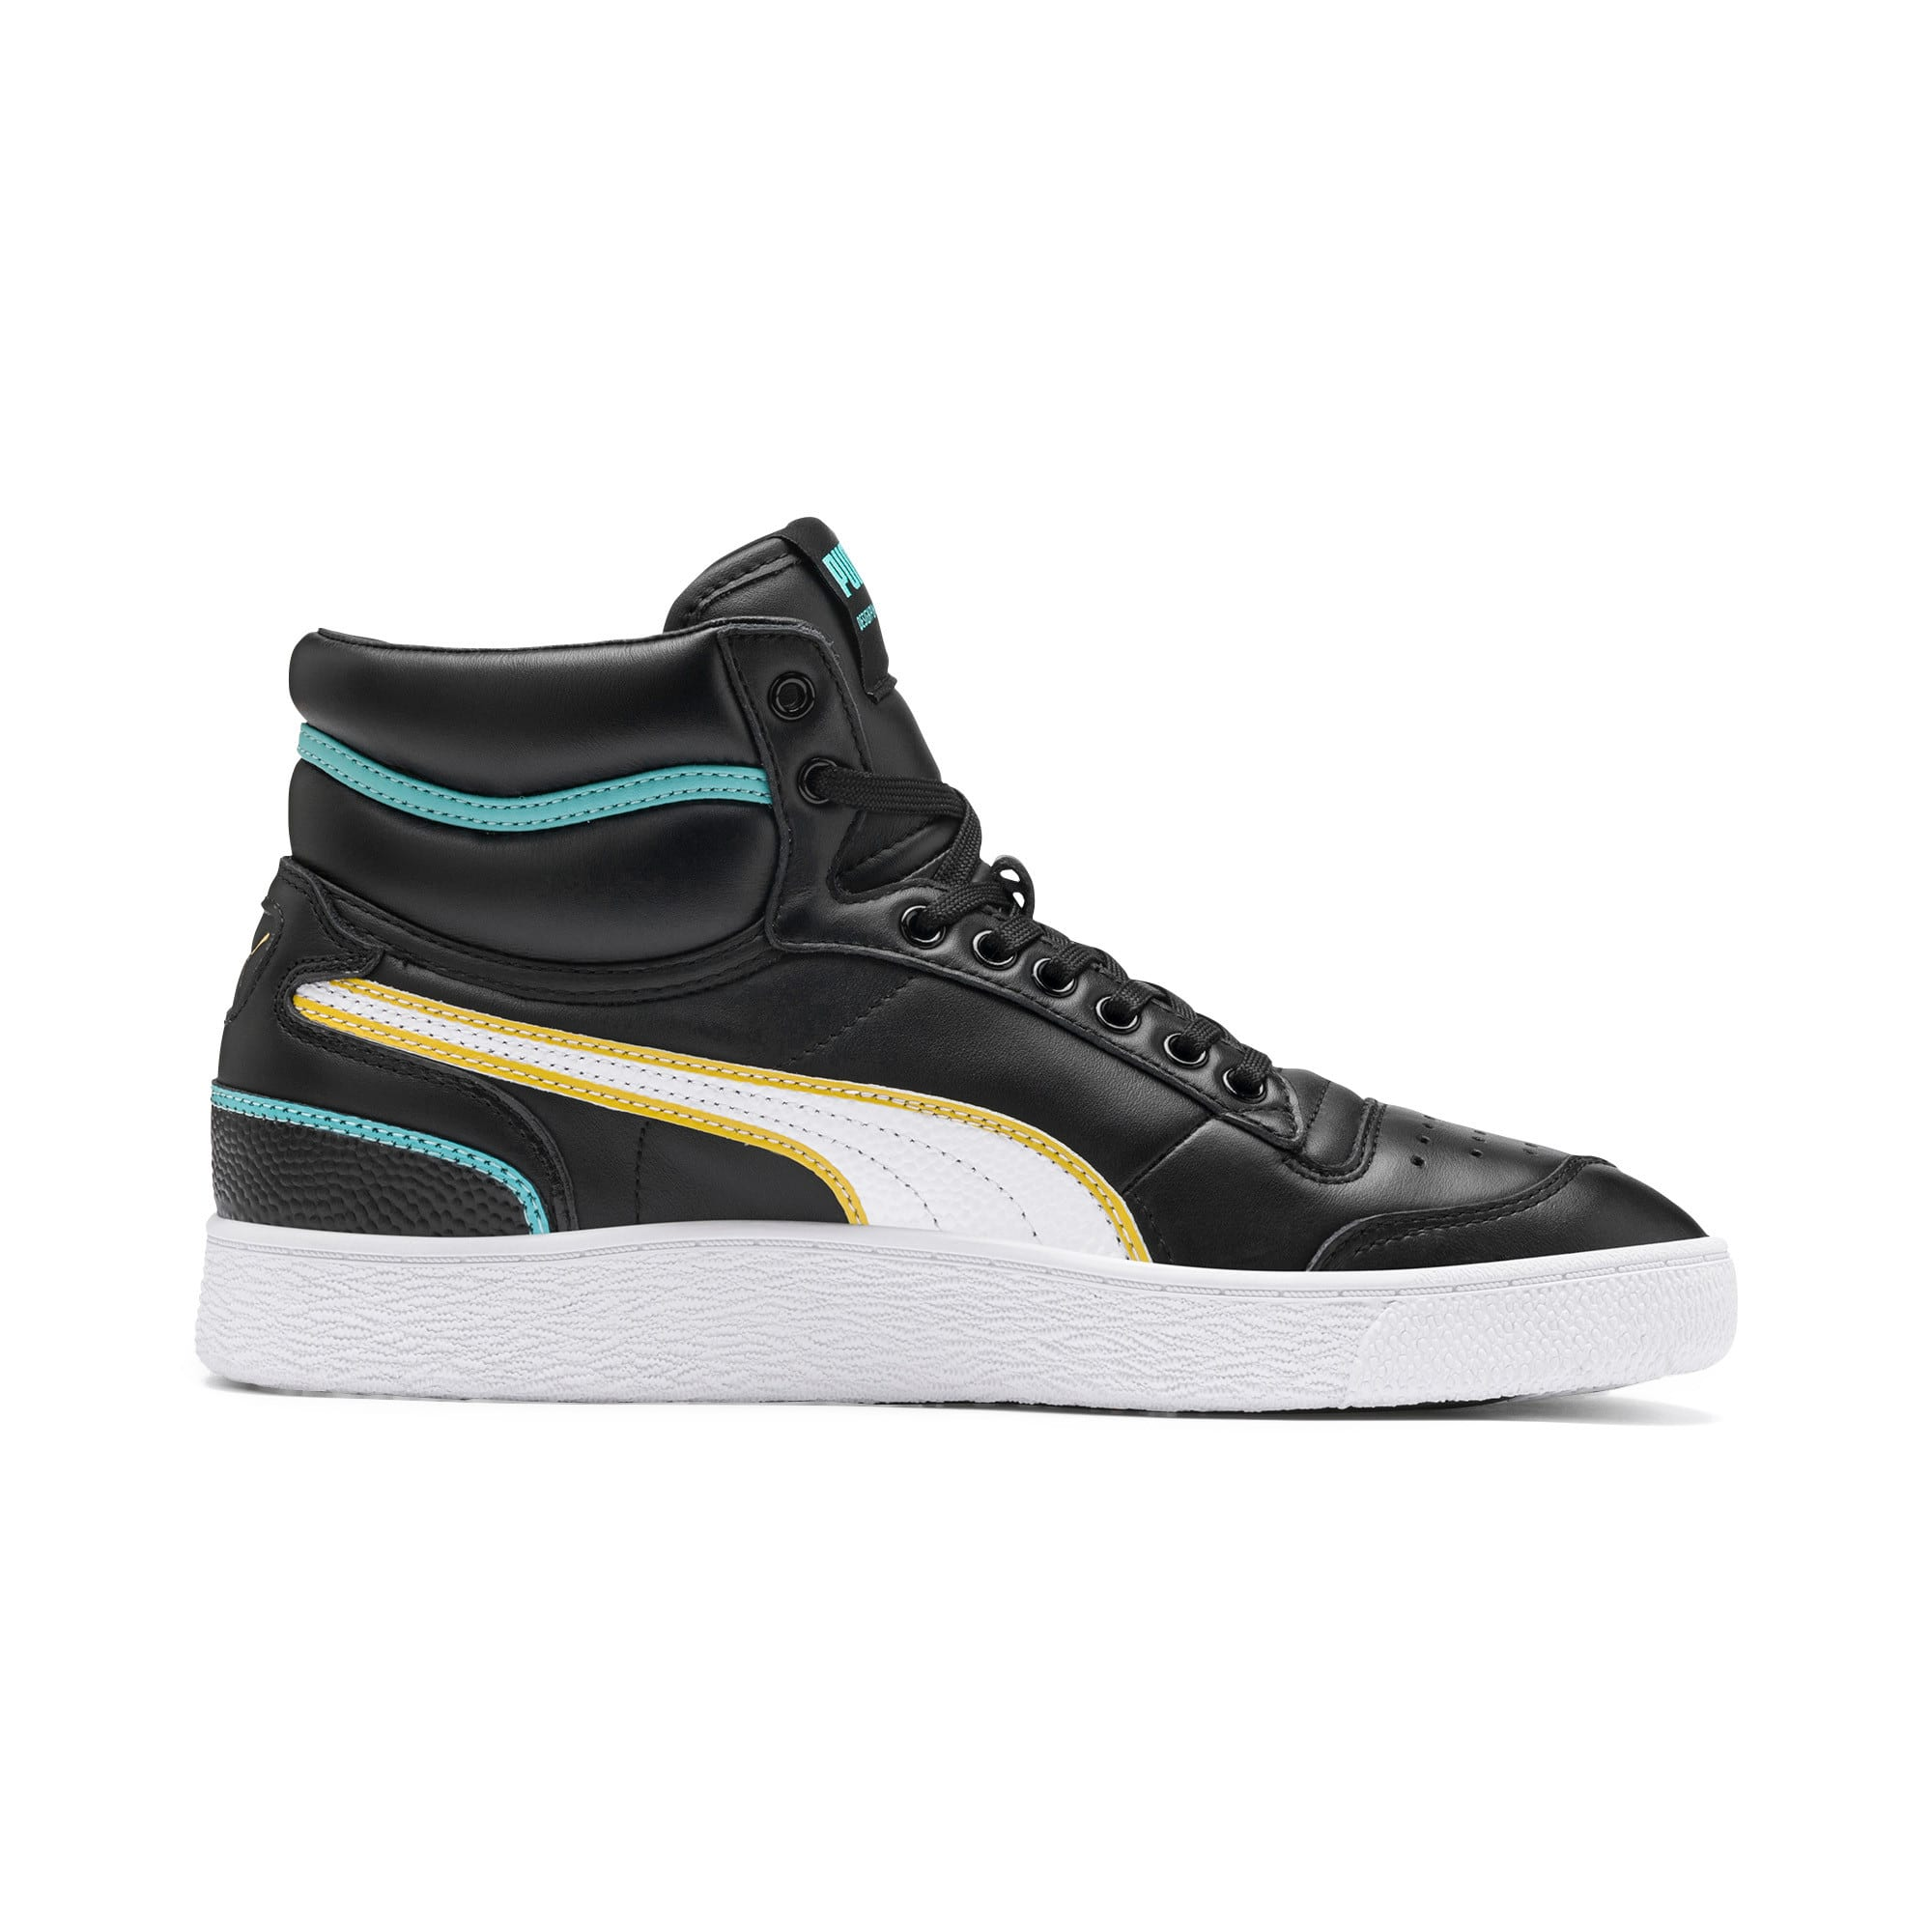 Thumbnail 6 of Ralph Sampson Mid Hoops Sneakers, Puma Blk-Puma Wht-Puma Wht, medium